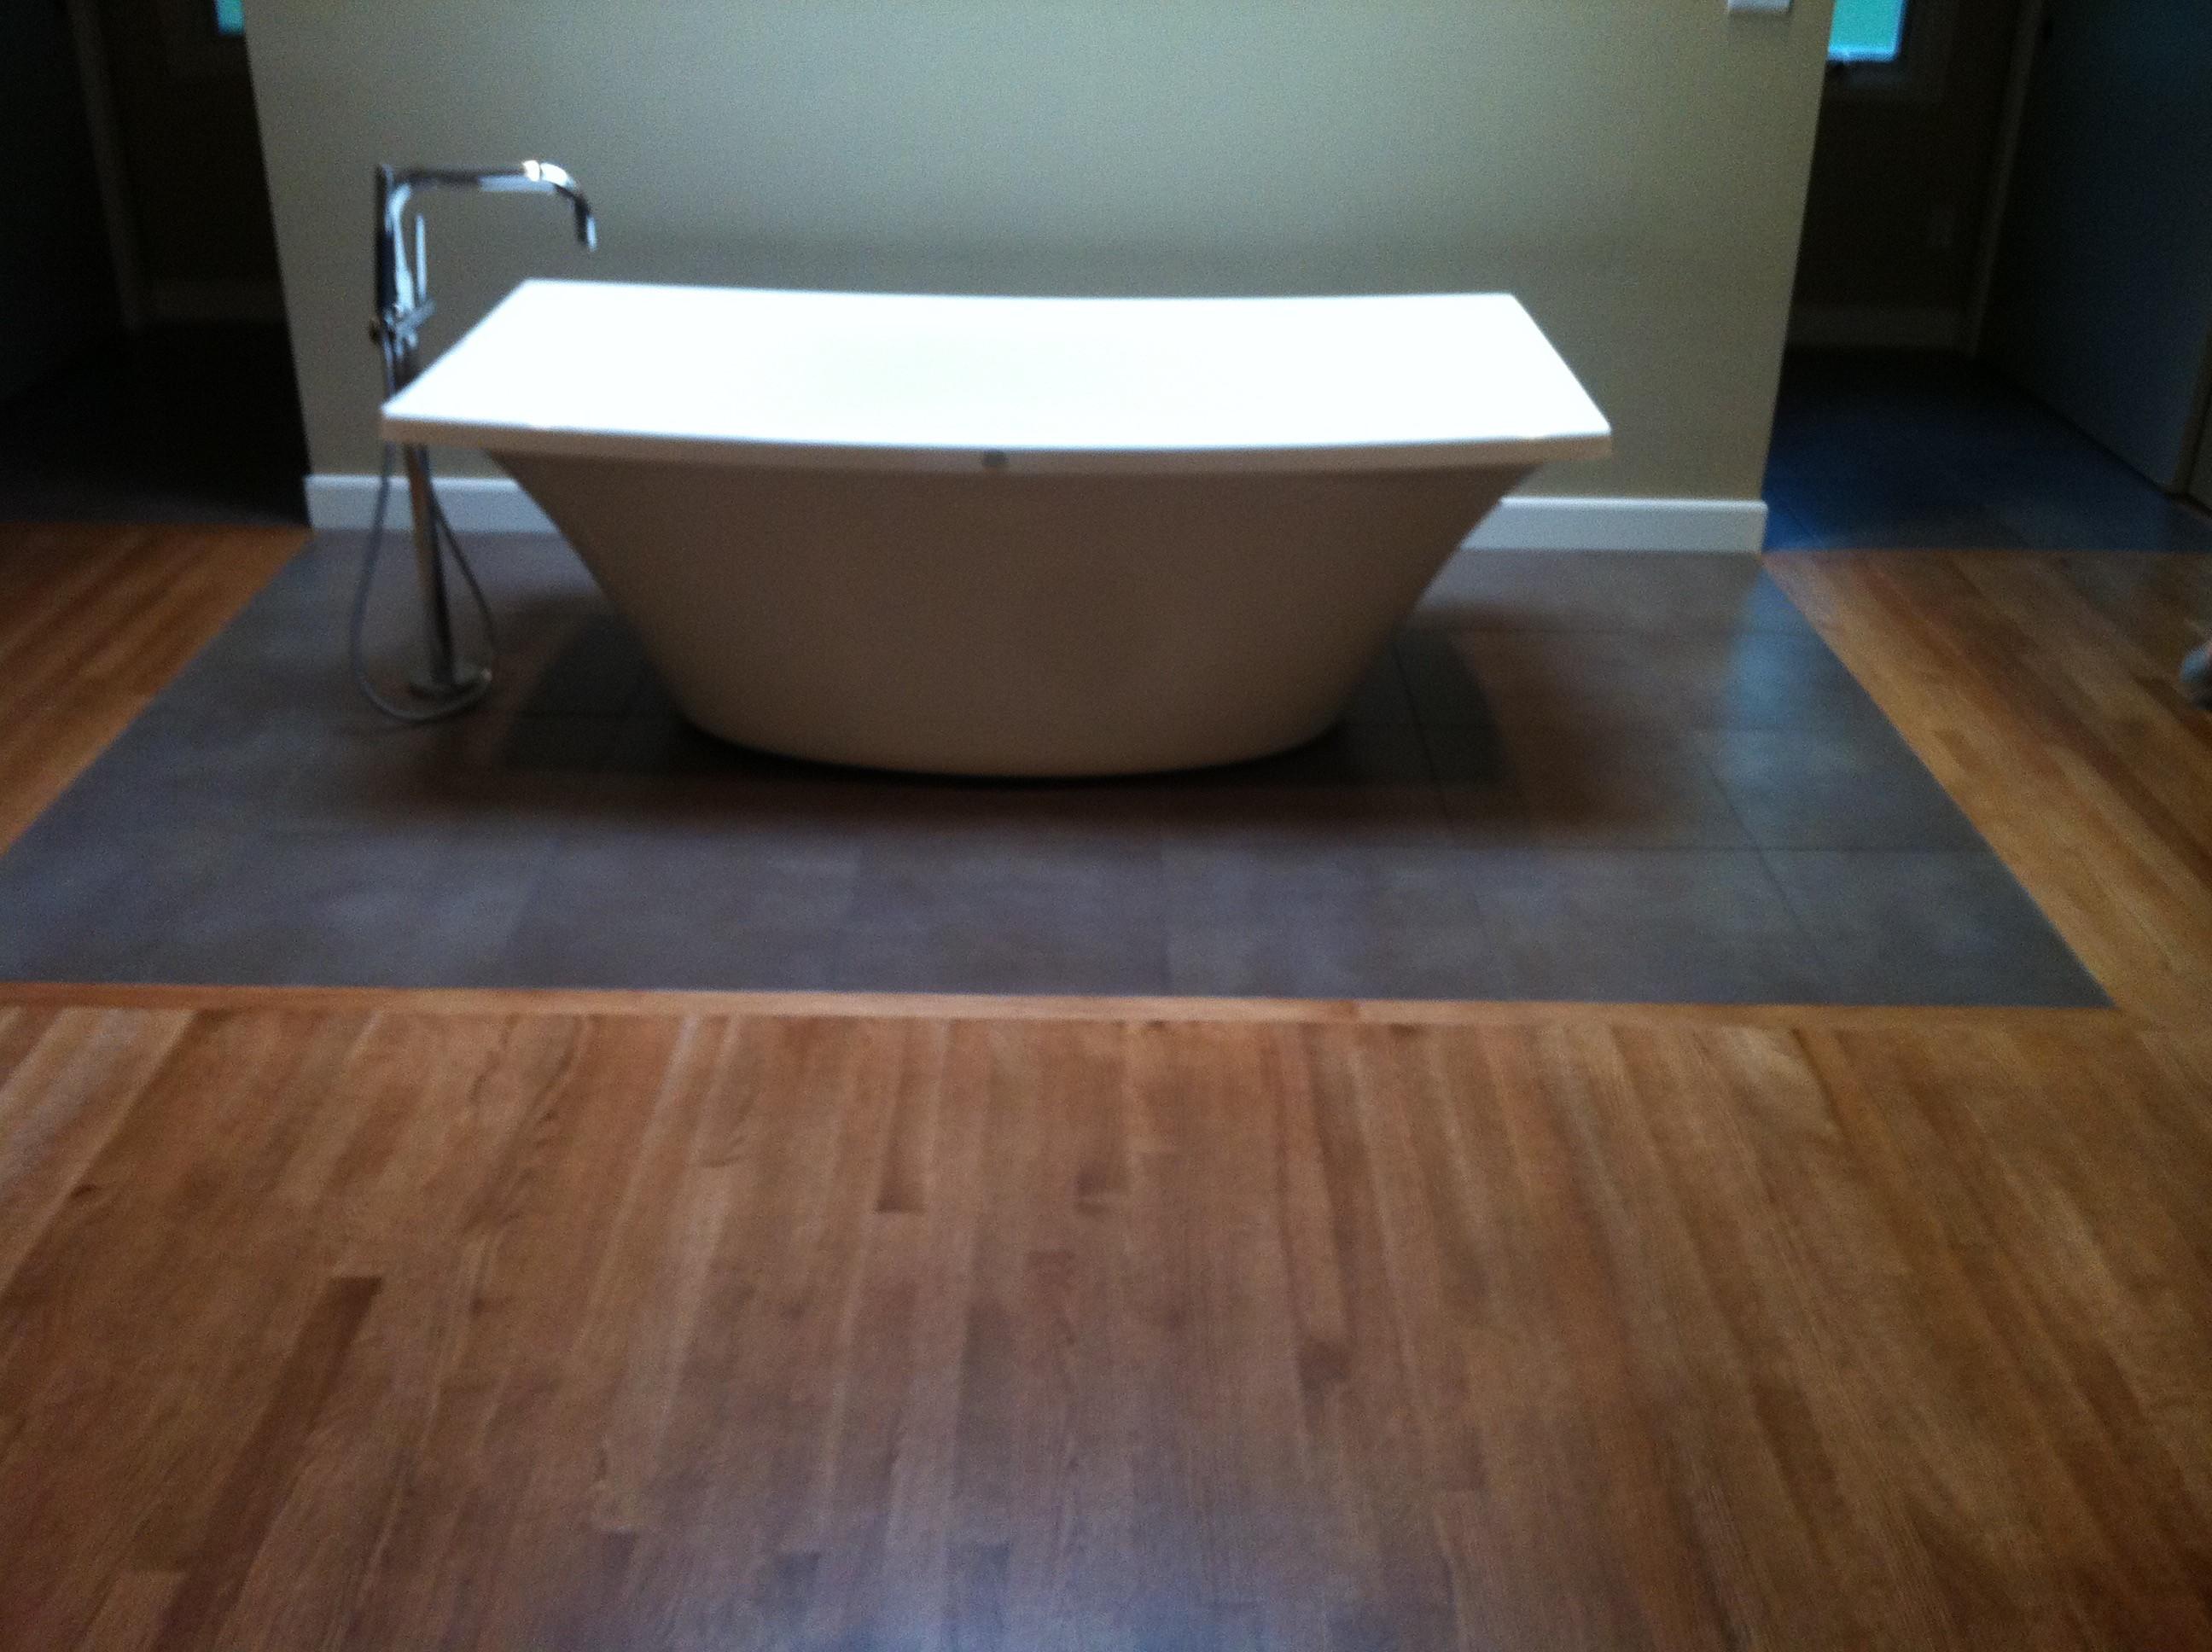 bona hardwood floor care system of flooring vancouver wa bona deep clean system real hardwood floors with flooring vancouver wa bona deep clean system real hardwood floors